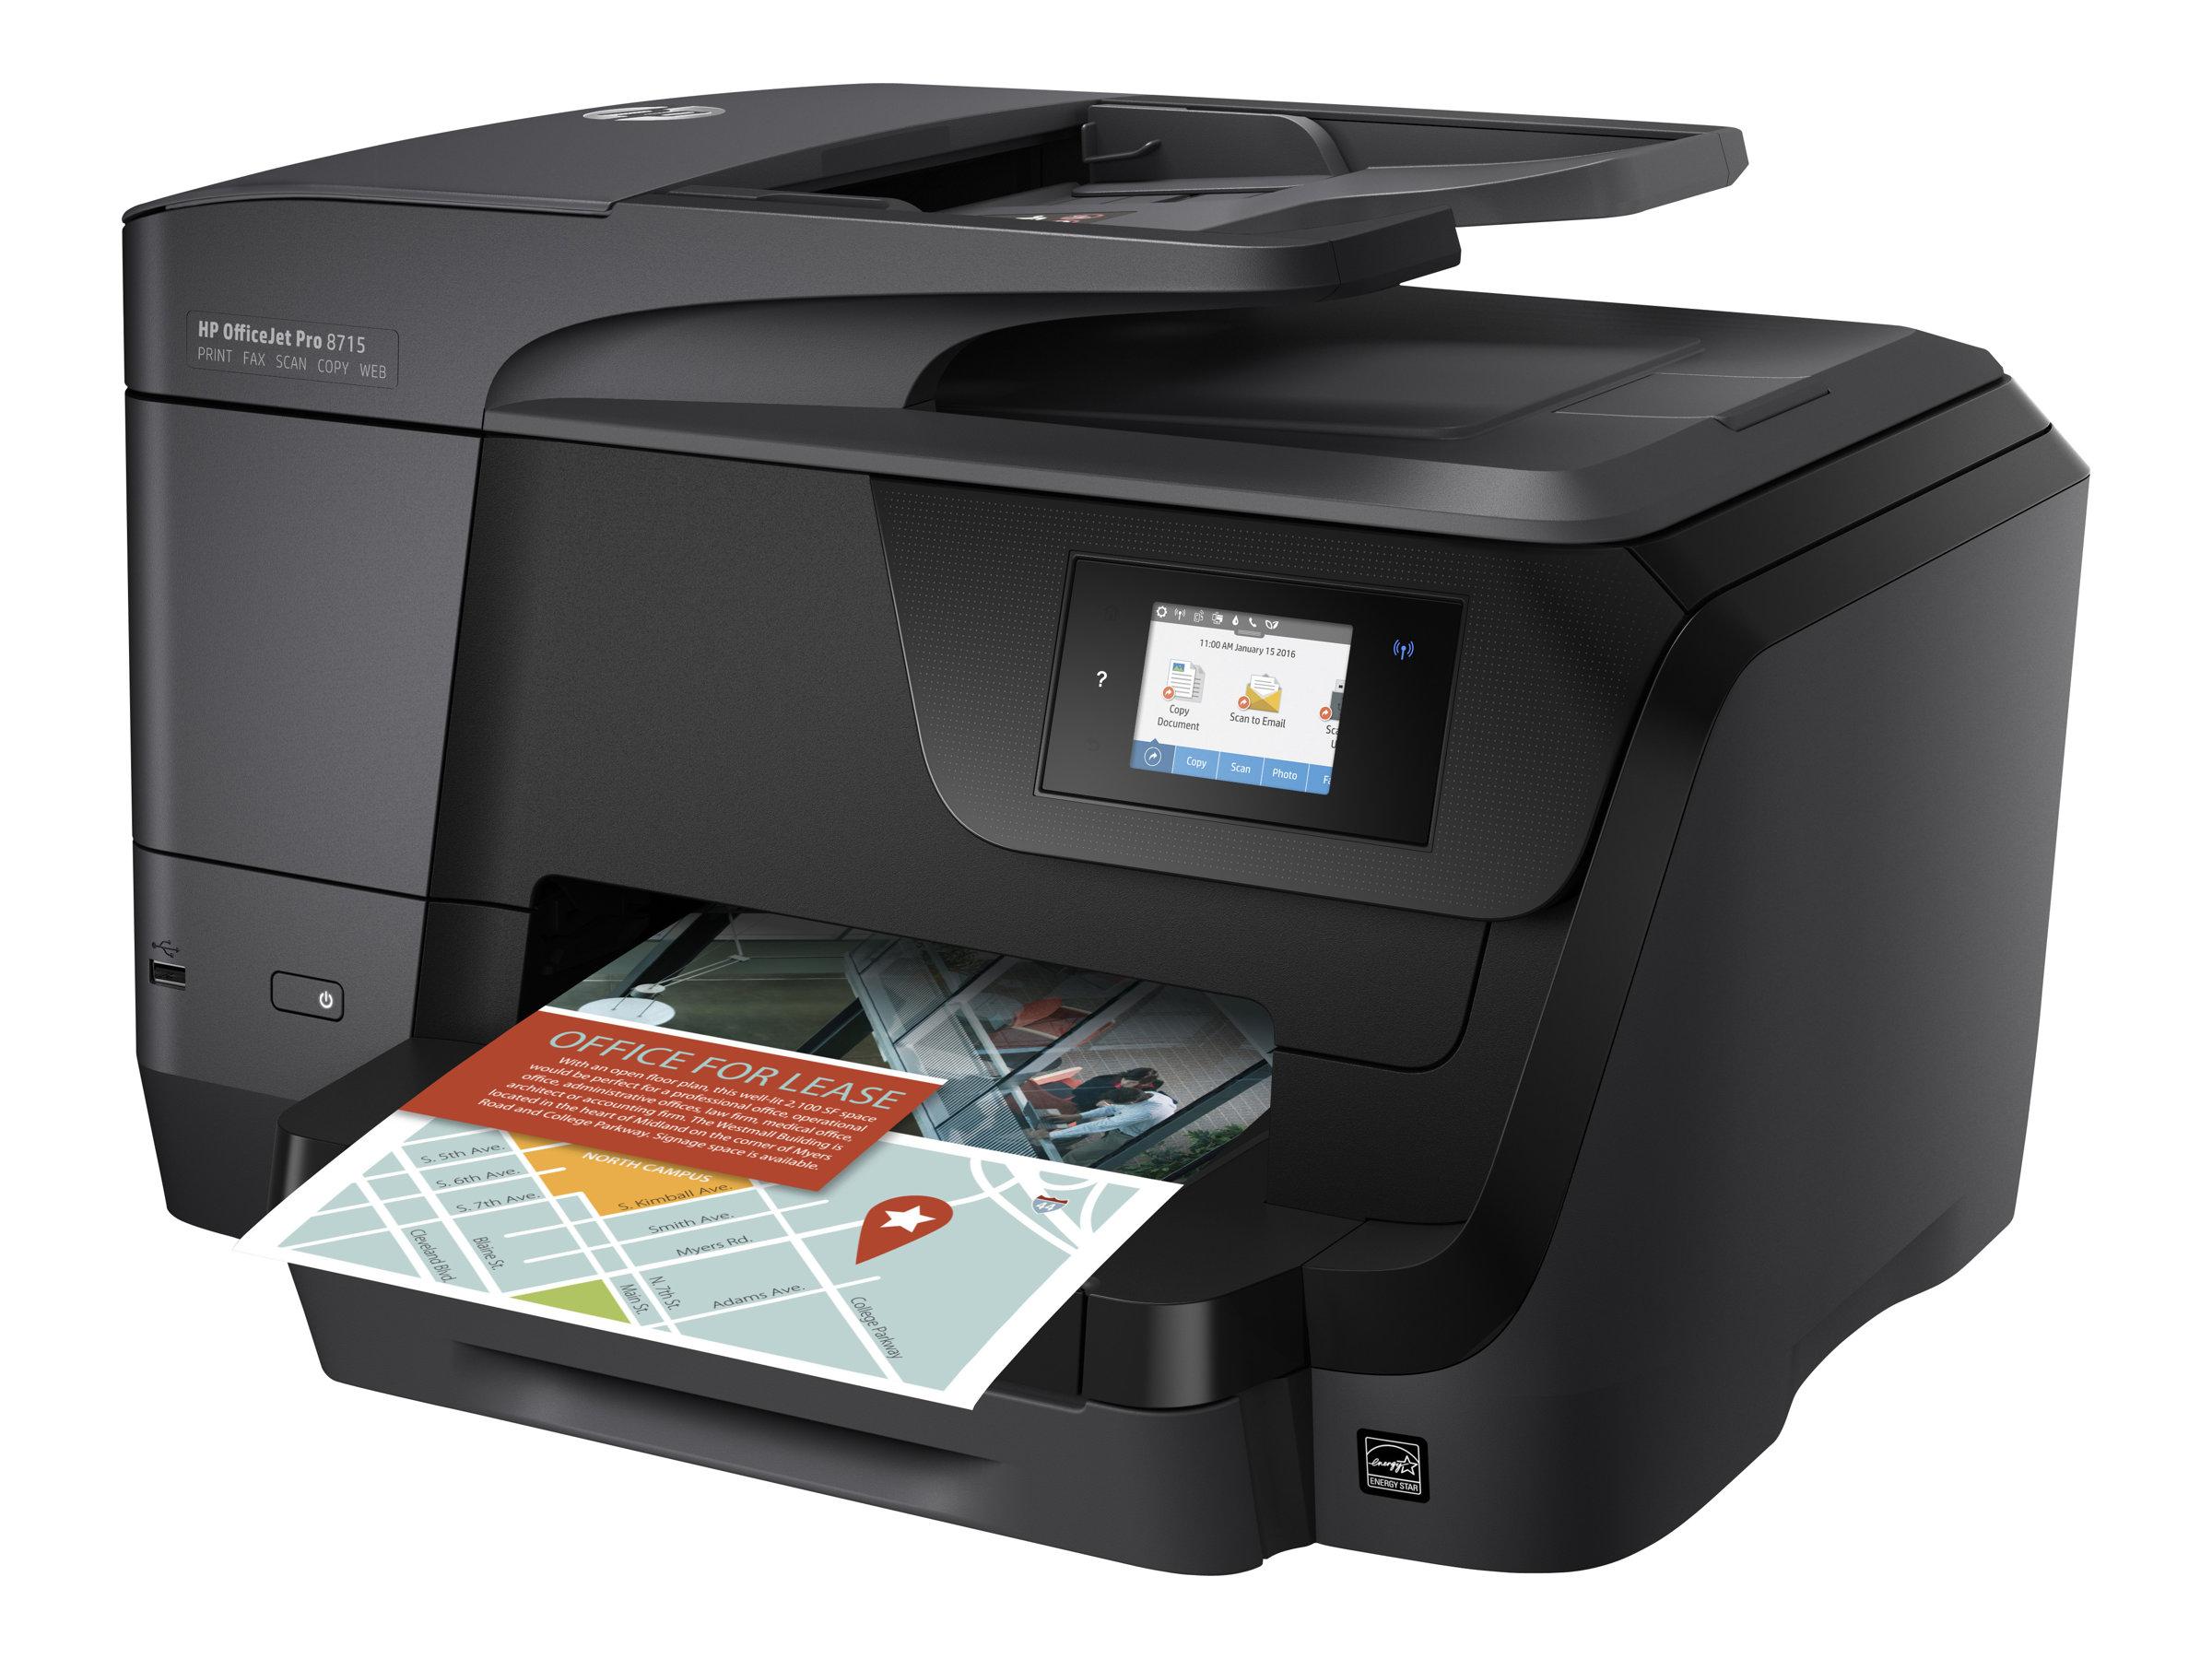 HP Officejet Pro 8715 All-in-One - Multifunktionsdrucker - Farbe - Tintenstrahl - A4 (210 x 297 mm), Legal (216 x 356 mm) (Origi